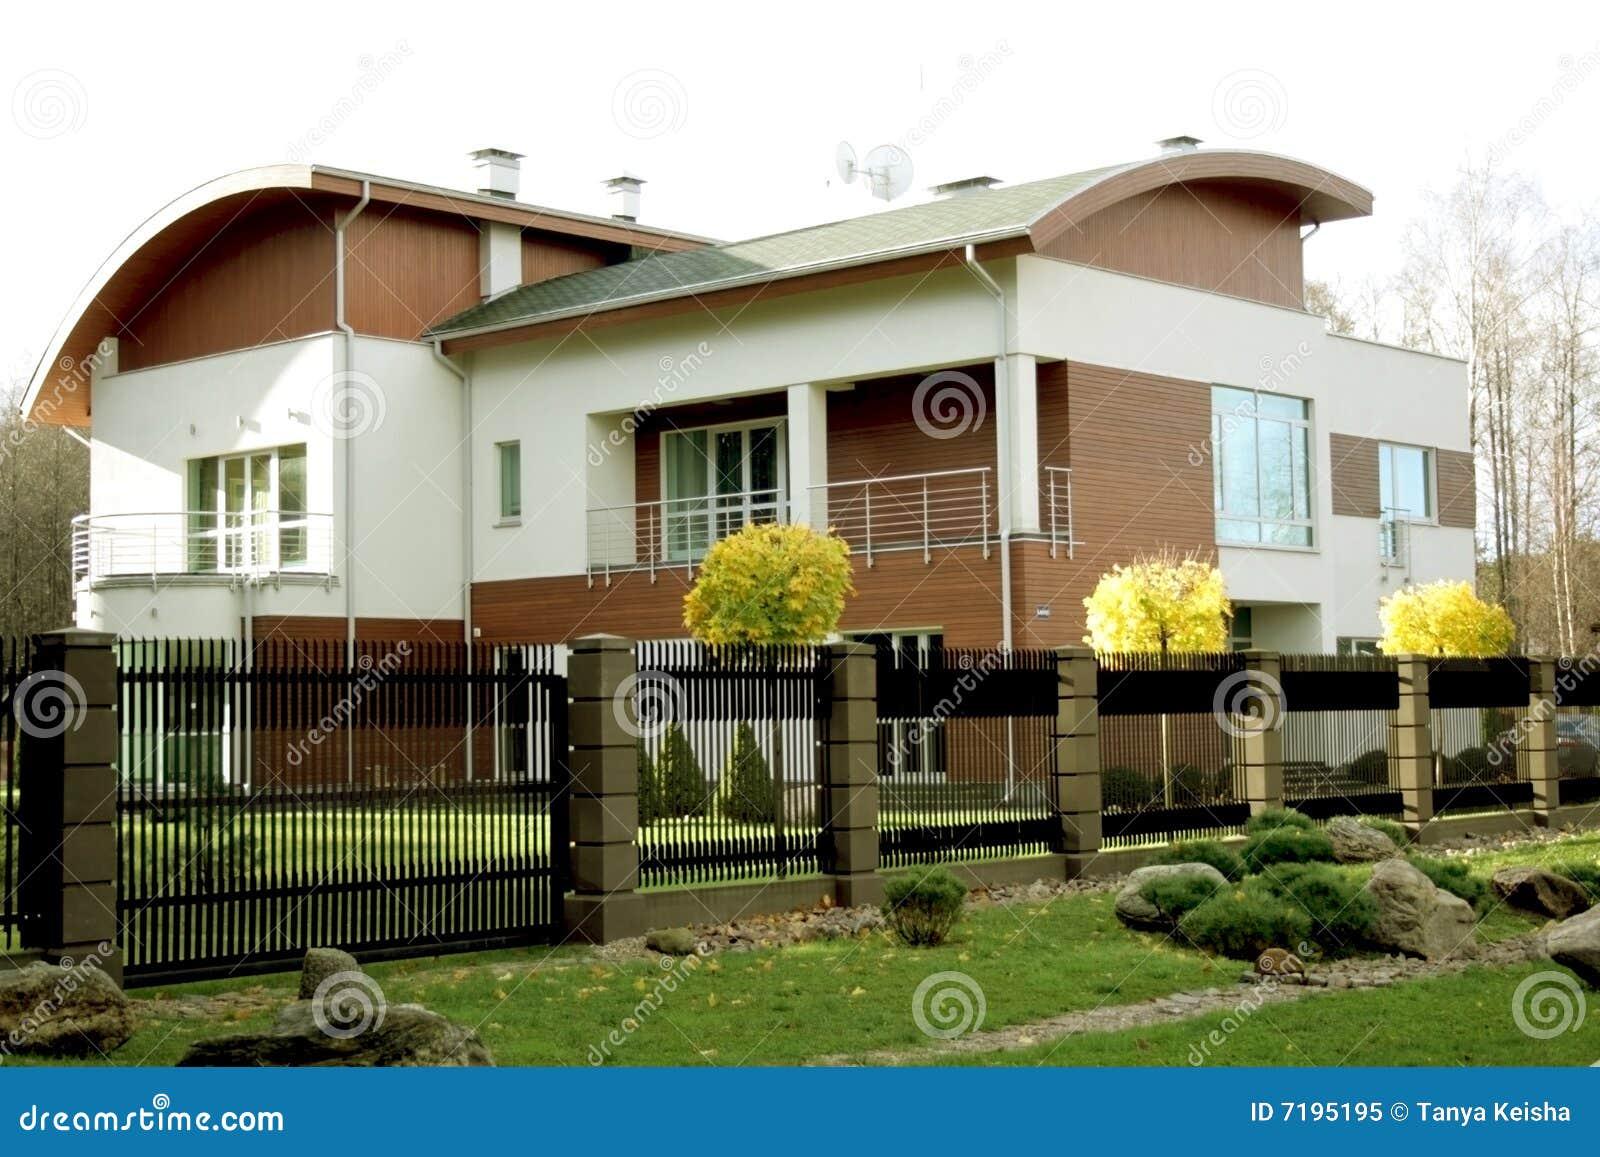 rchitecture la maison moderne neuve photo libre de droits architecture de - Maison Moderne Architecte